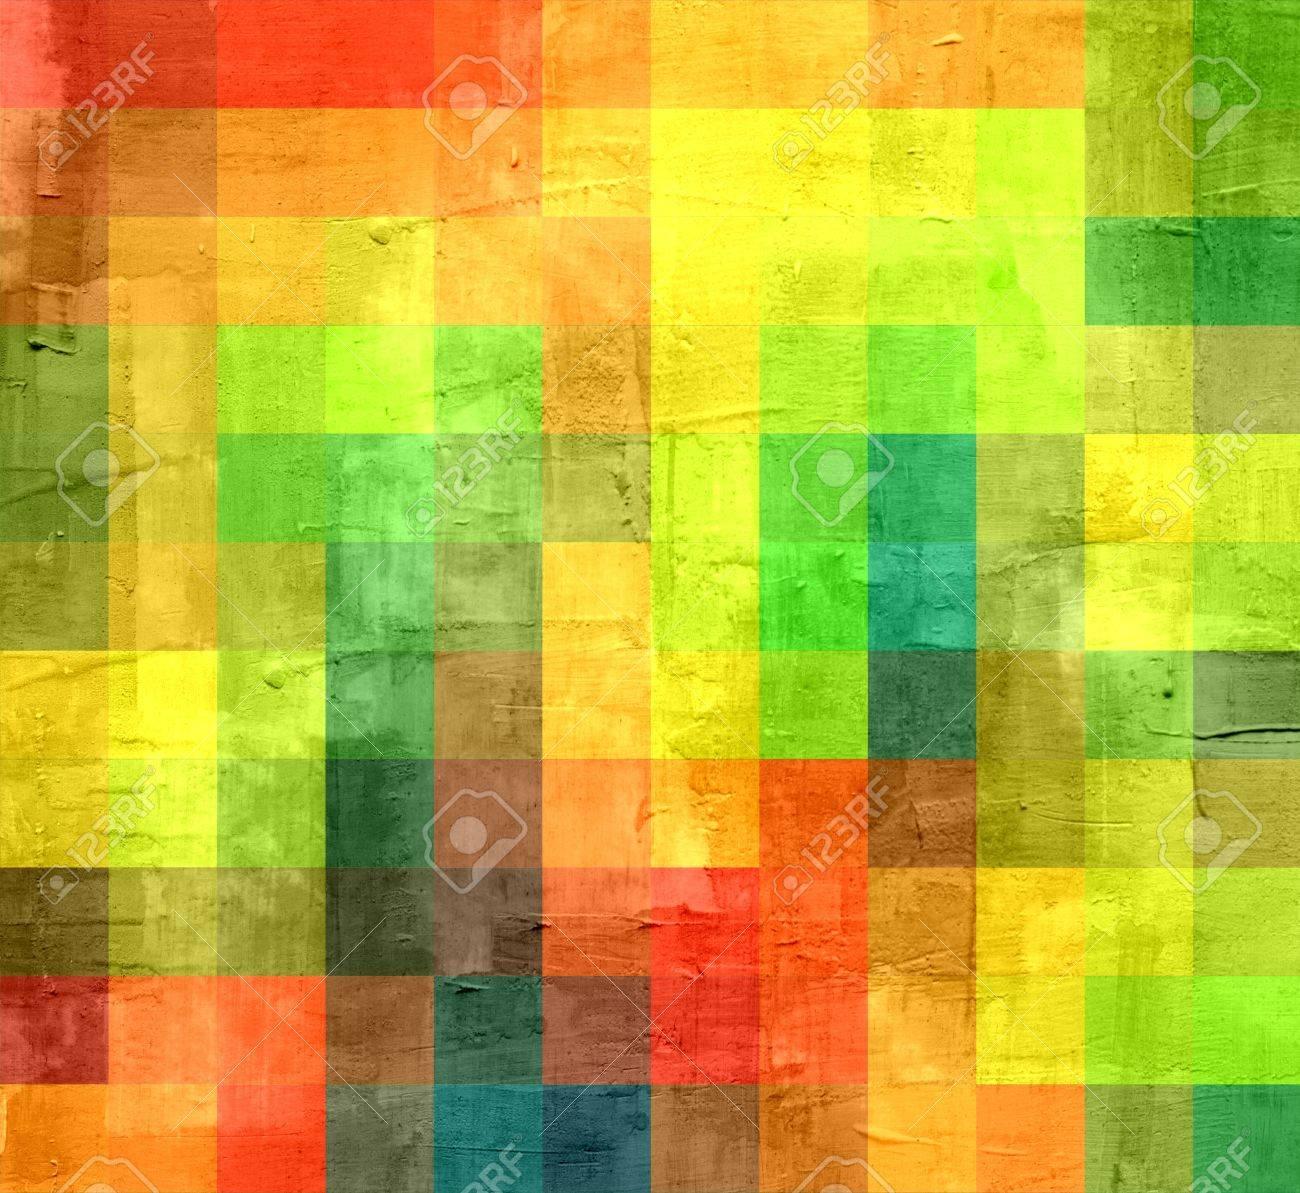 Geometric grunge background in retro colors Stock Photo - 15851550